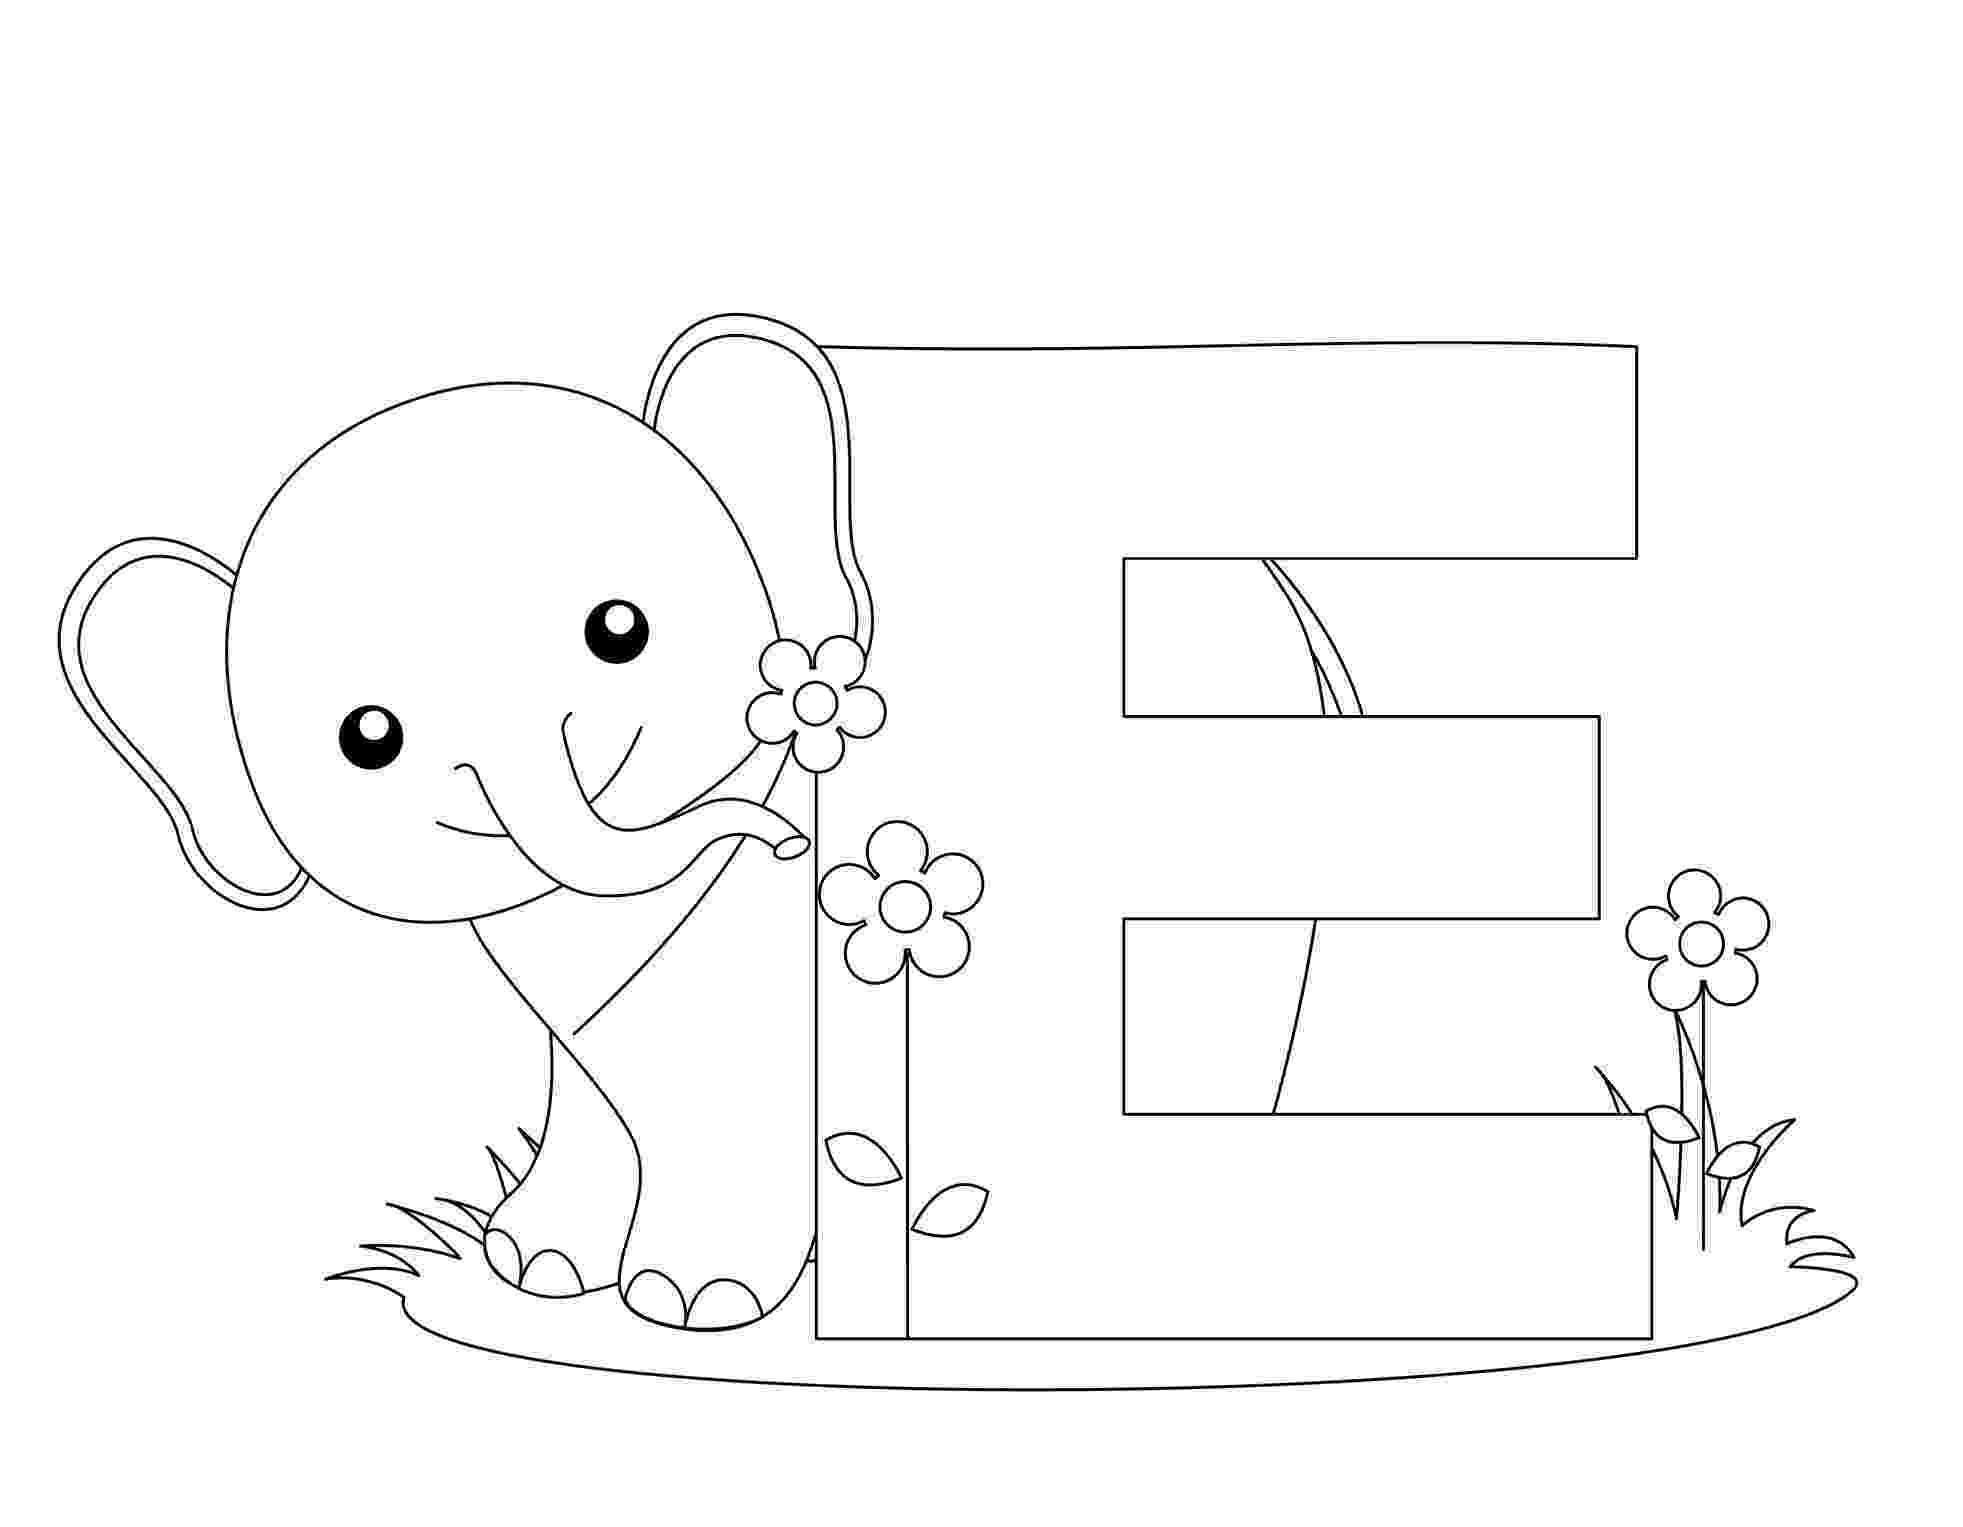 abc coloring book download alphabet coloring pages mr printables coloring abc download book